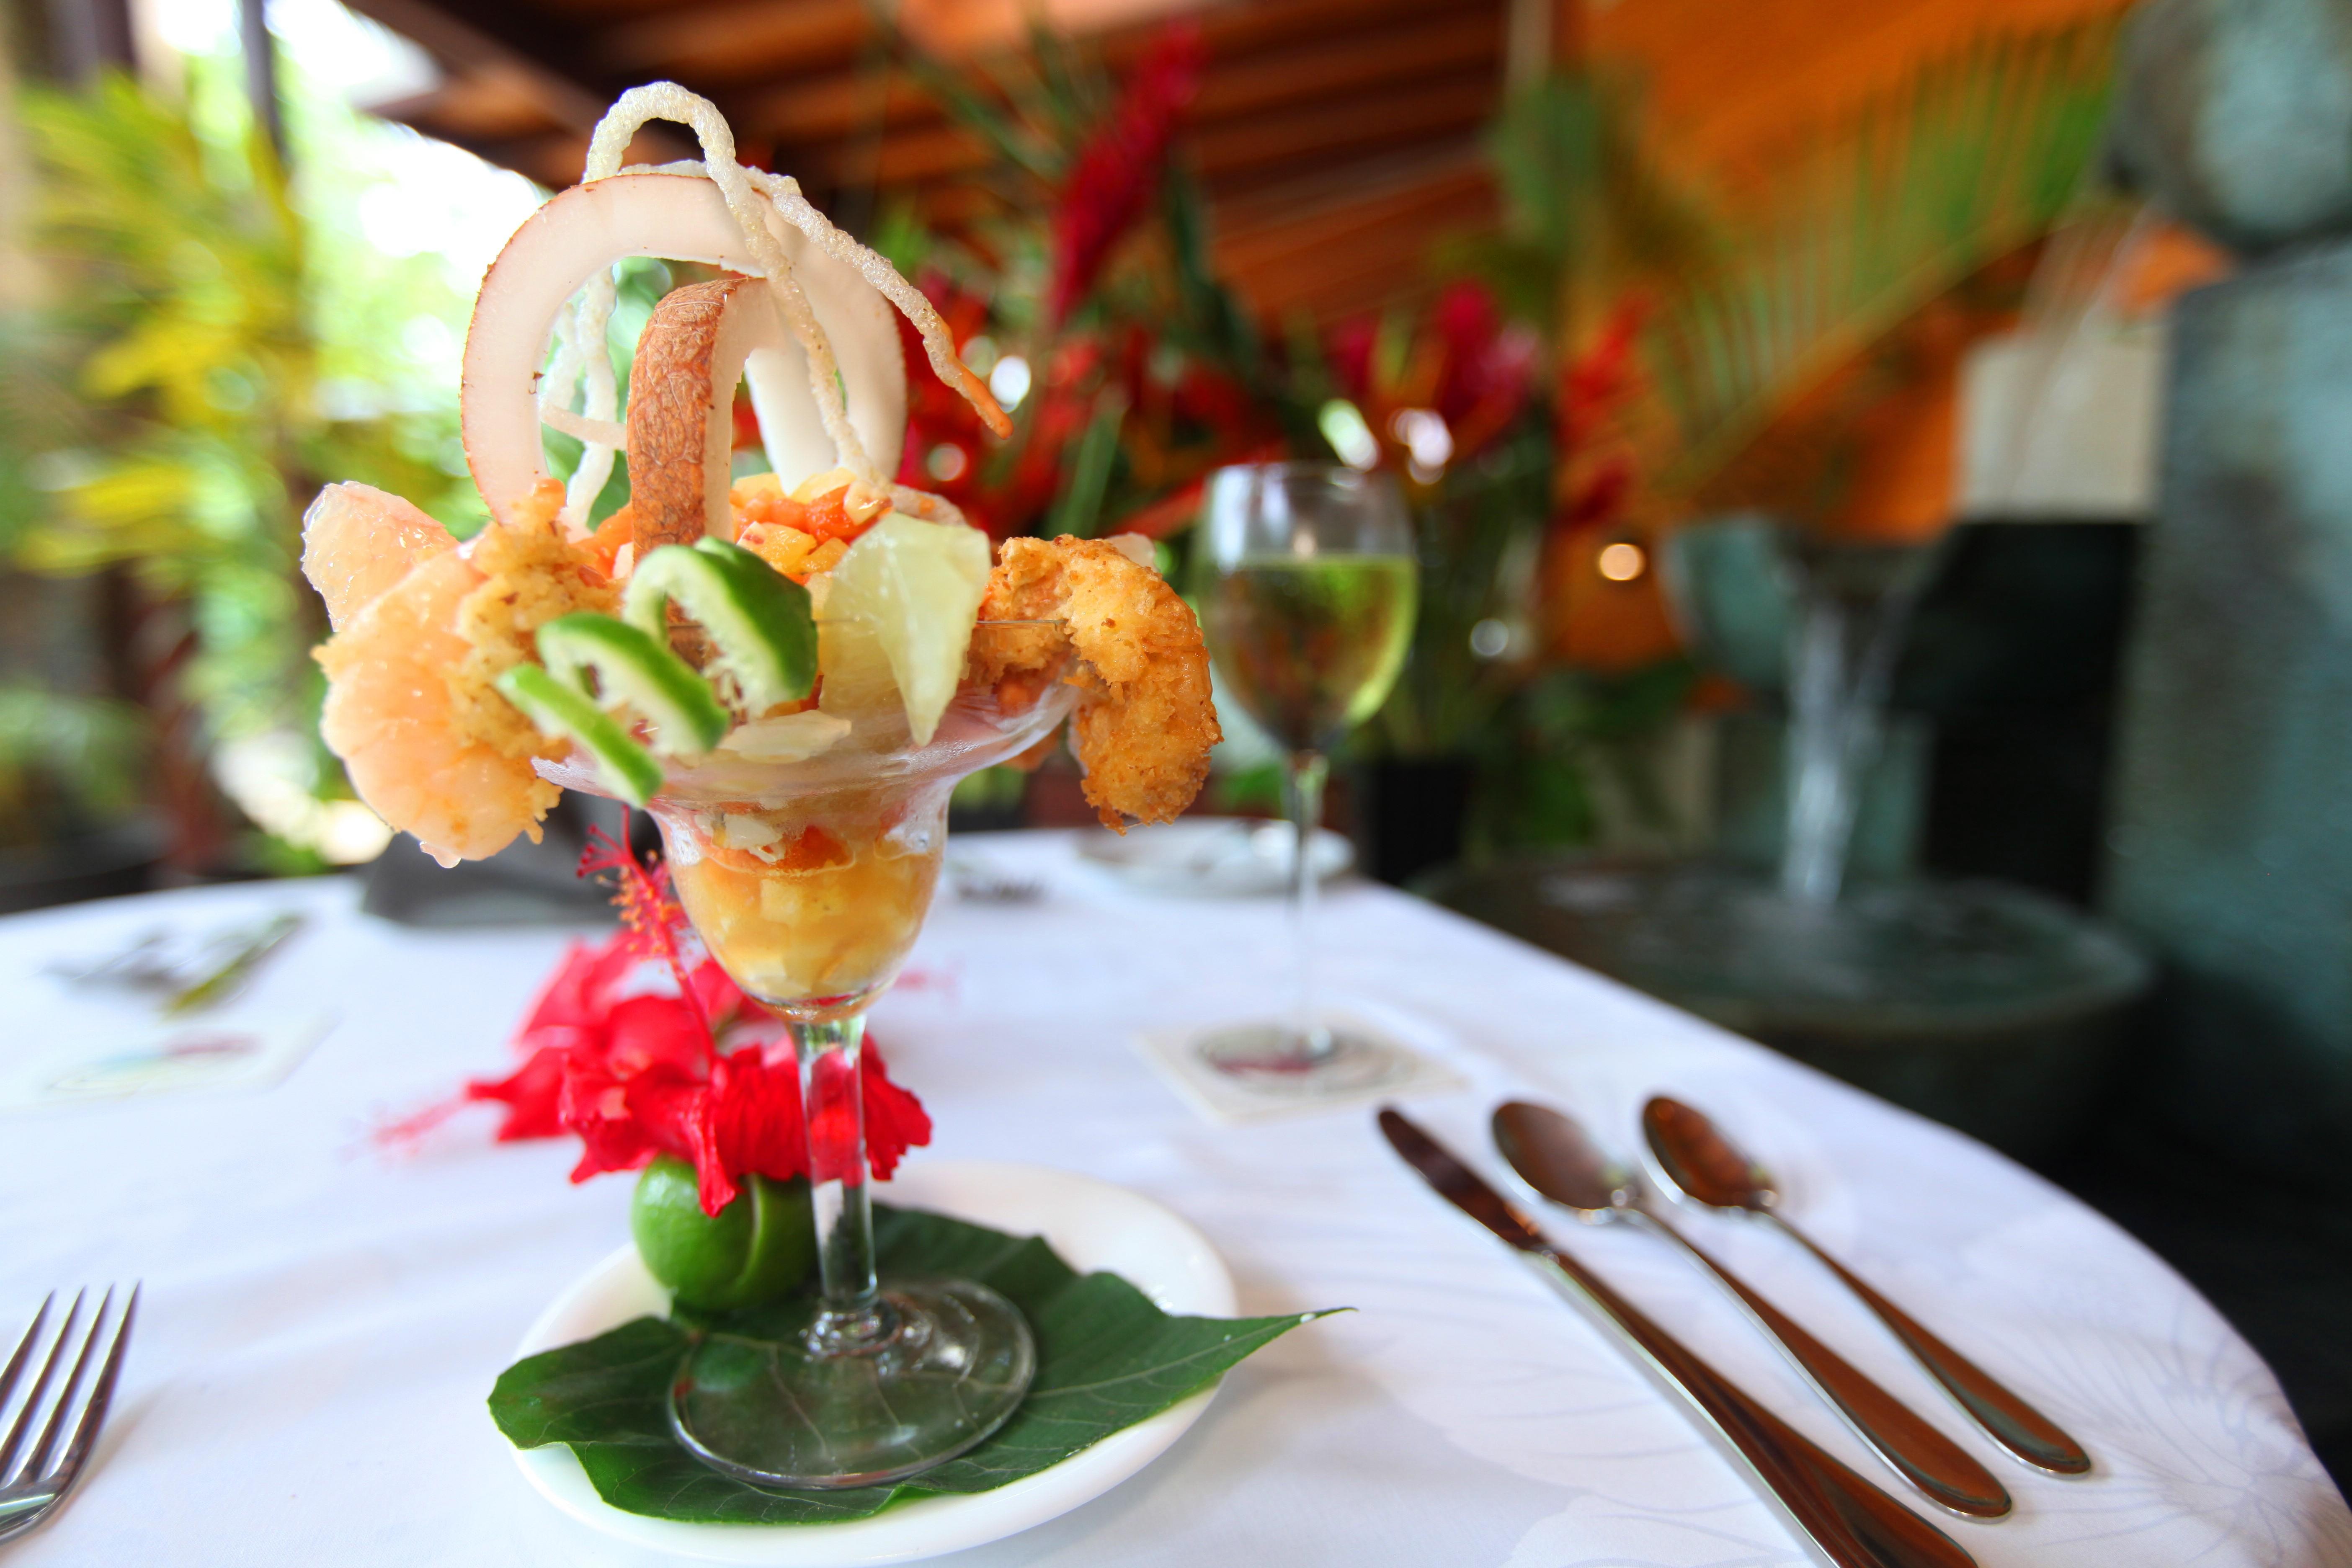 Chef Rachel's Coconut Prawn Cocktail